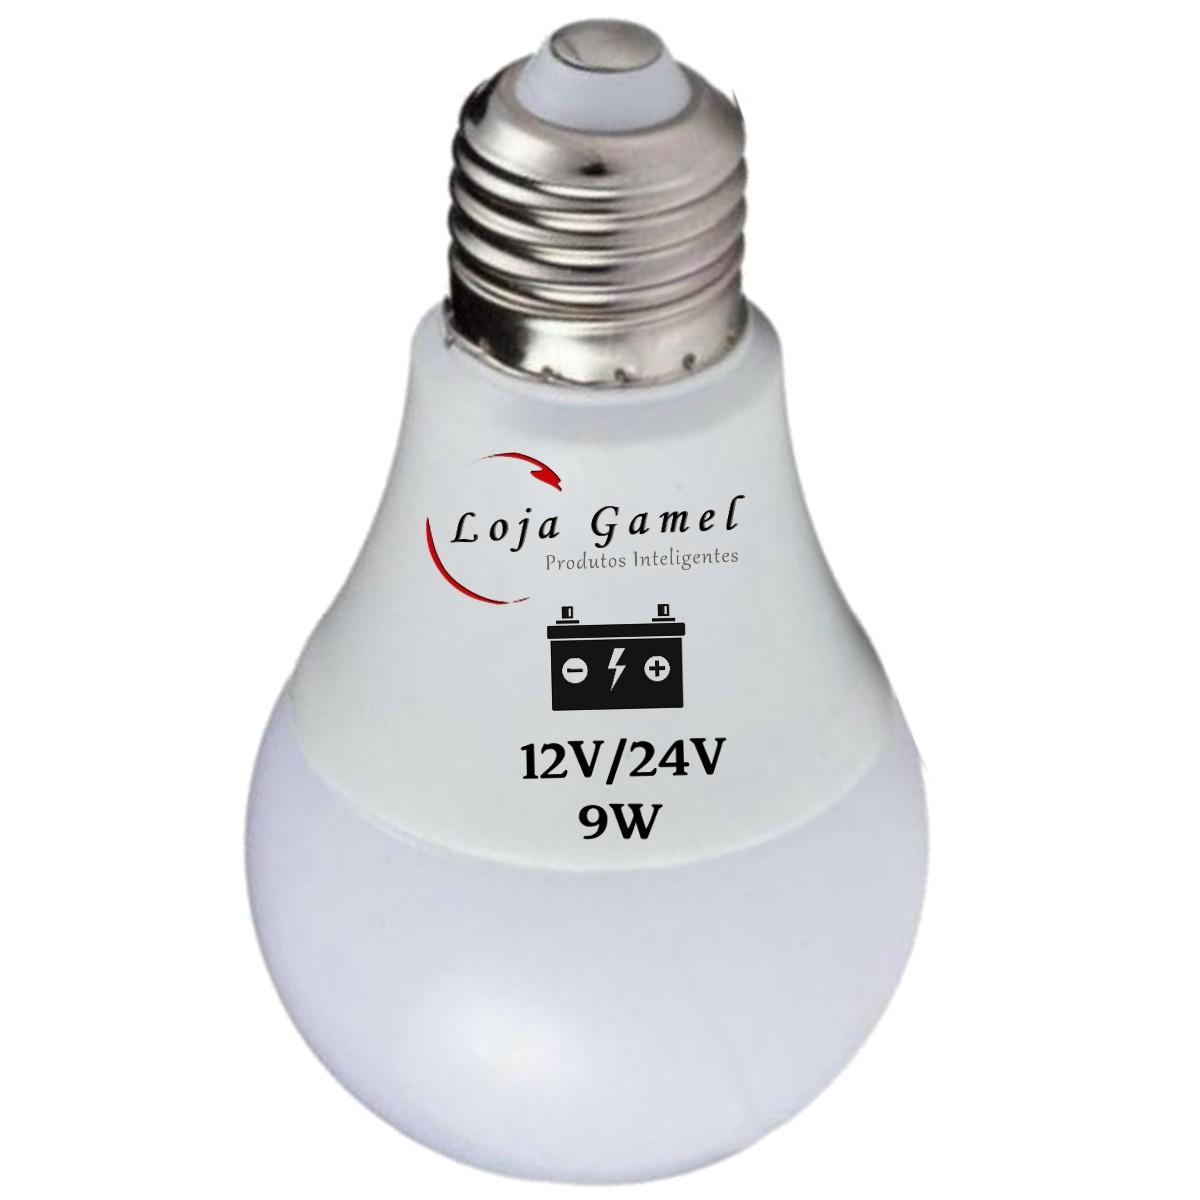 Foto5 - Lâmpada Led Bateria 12V / 24V - 9W 800 Lumens Kit 4un